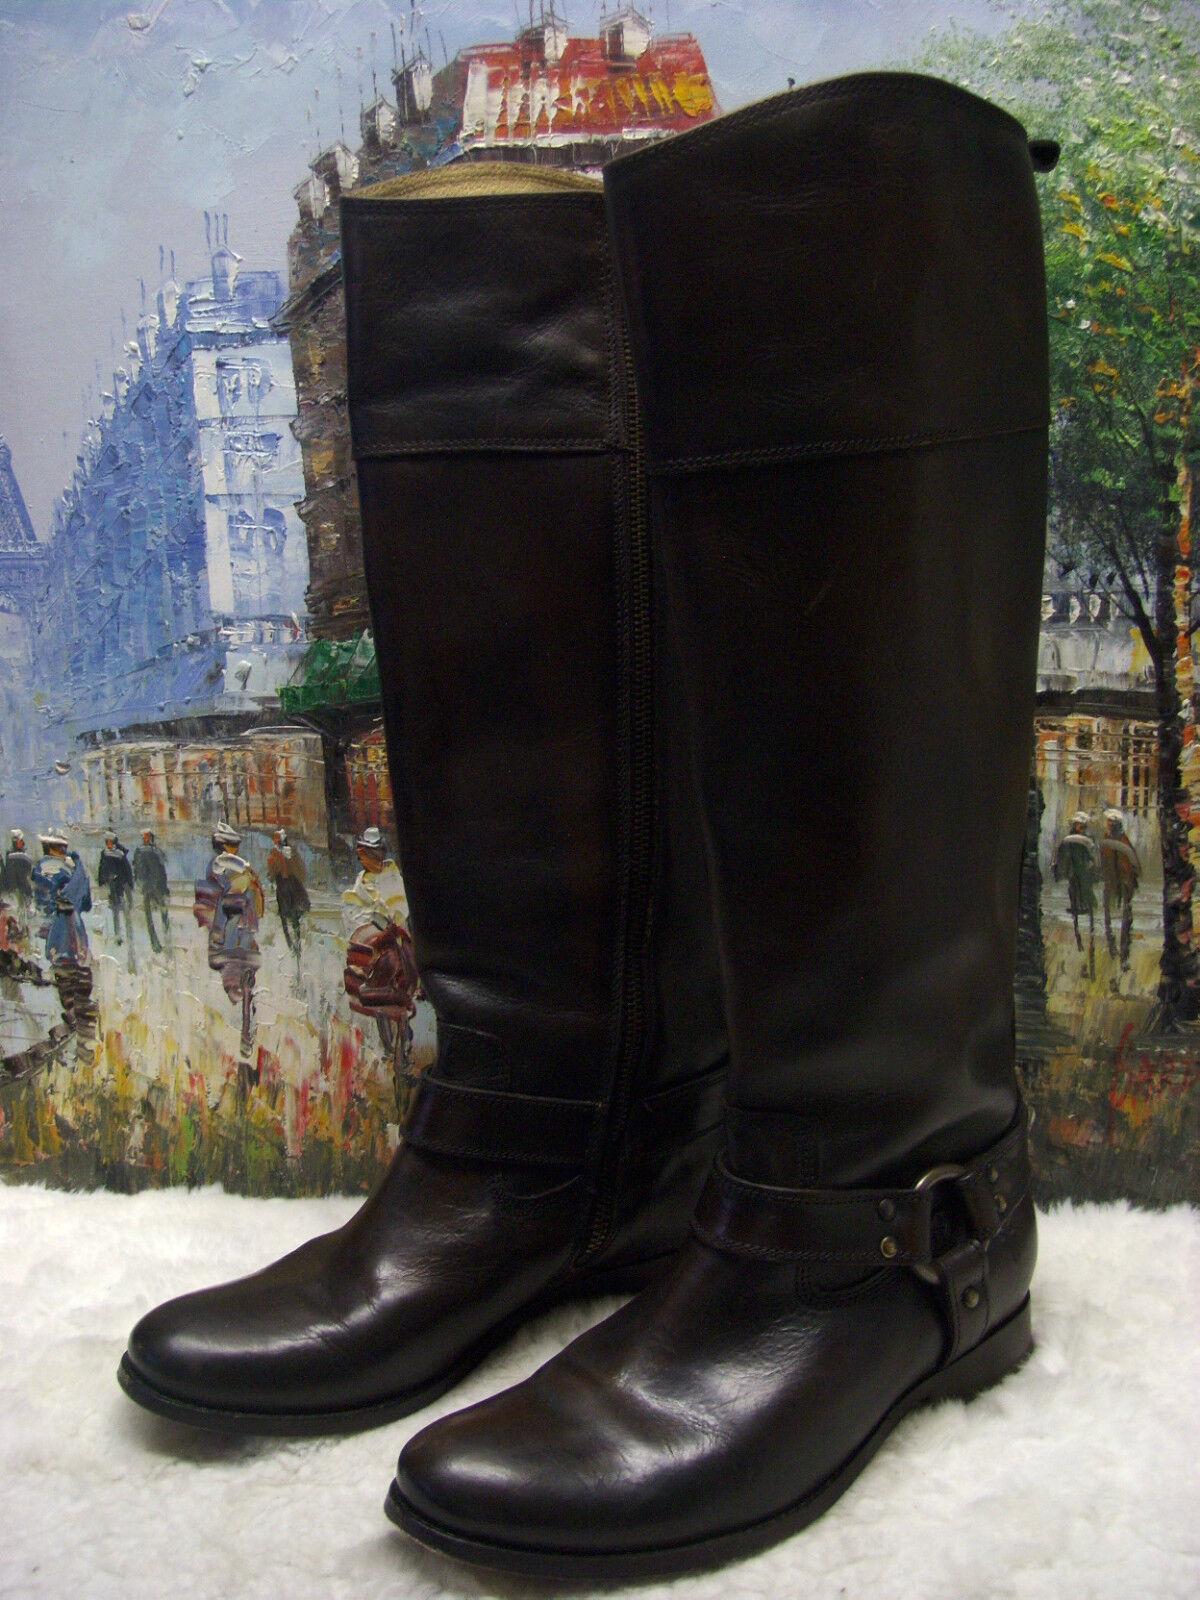 Frye 'Melissa Harness' Boot - Size 7B -  428